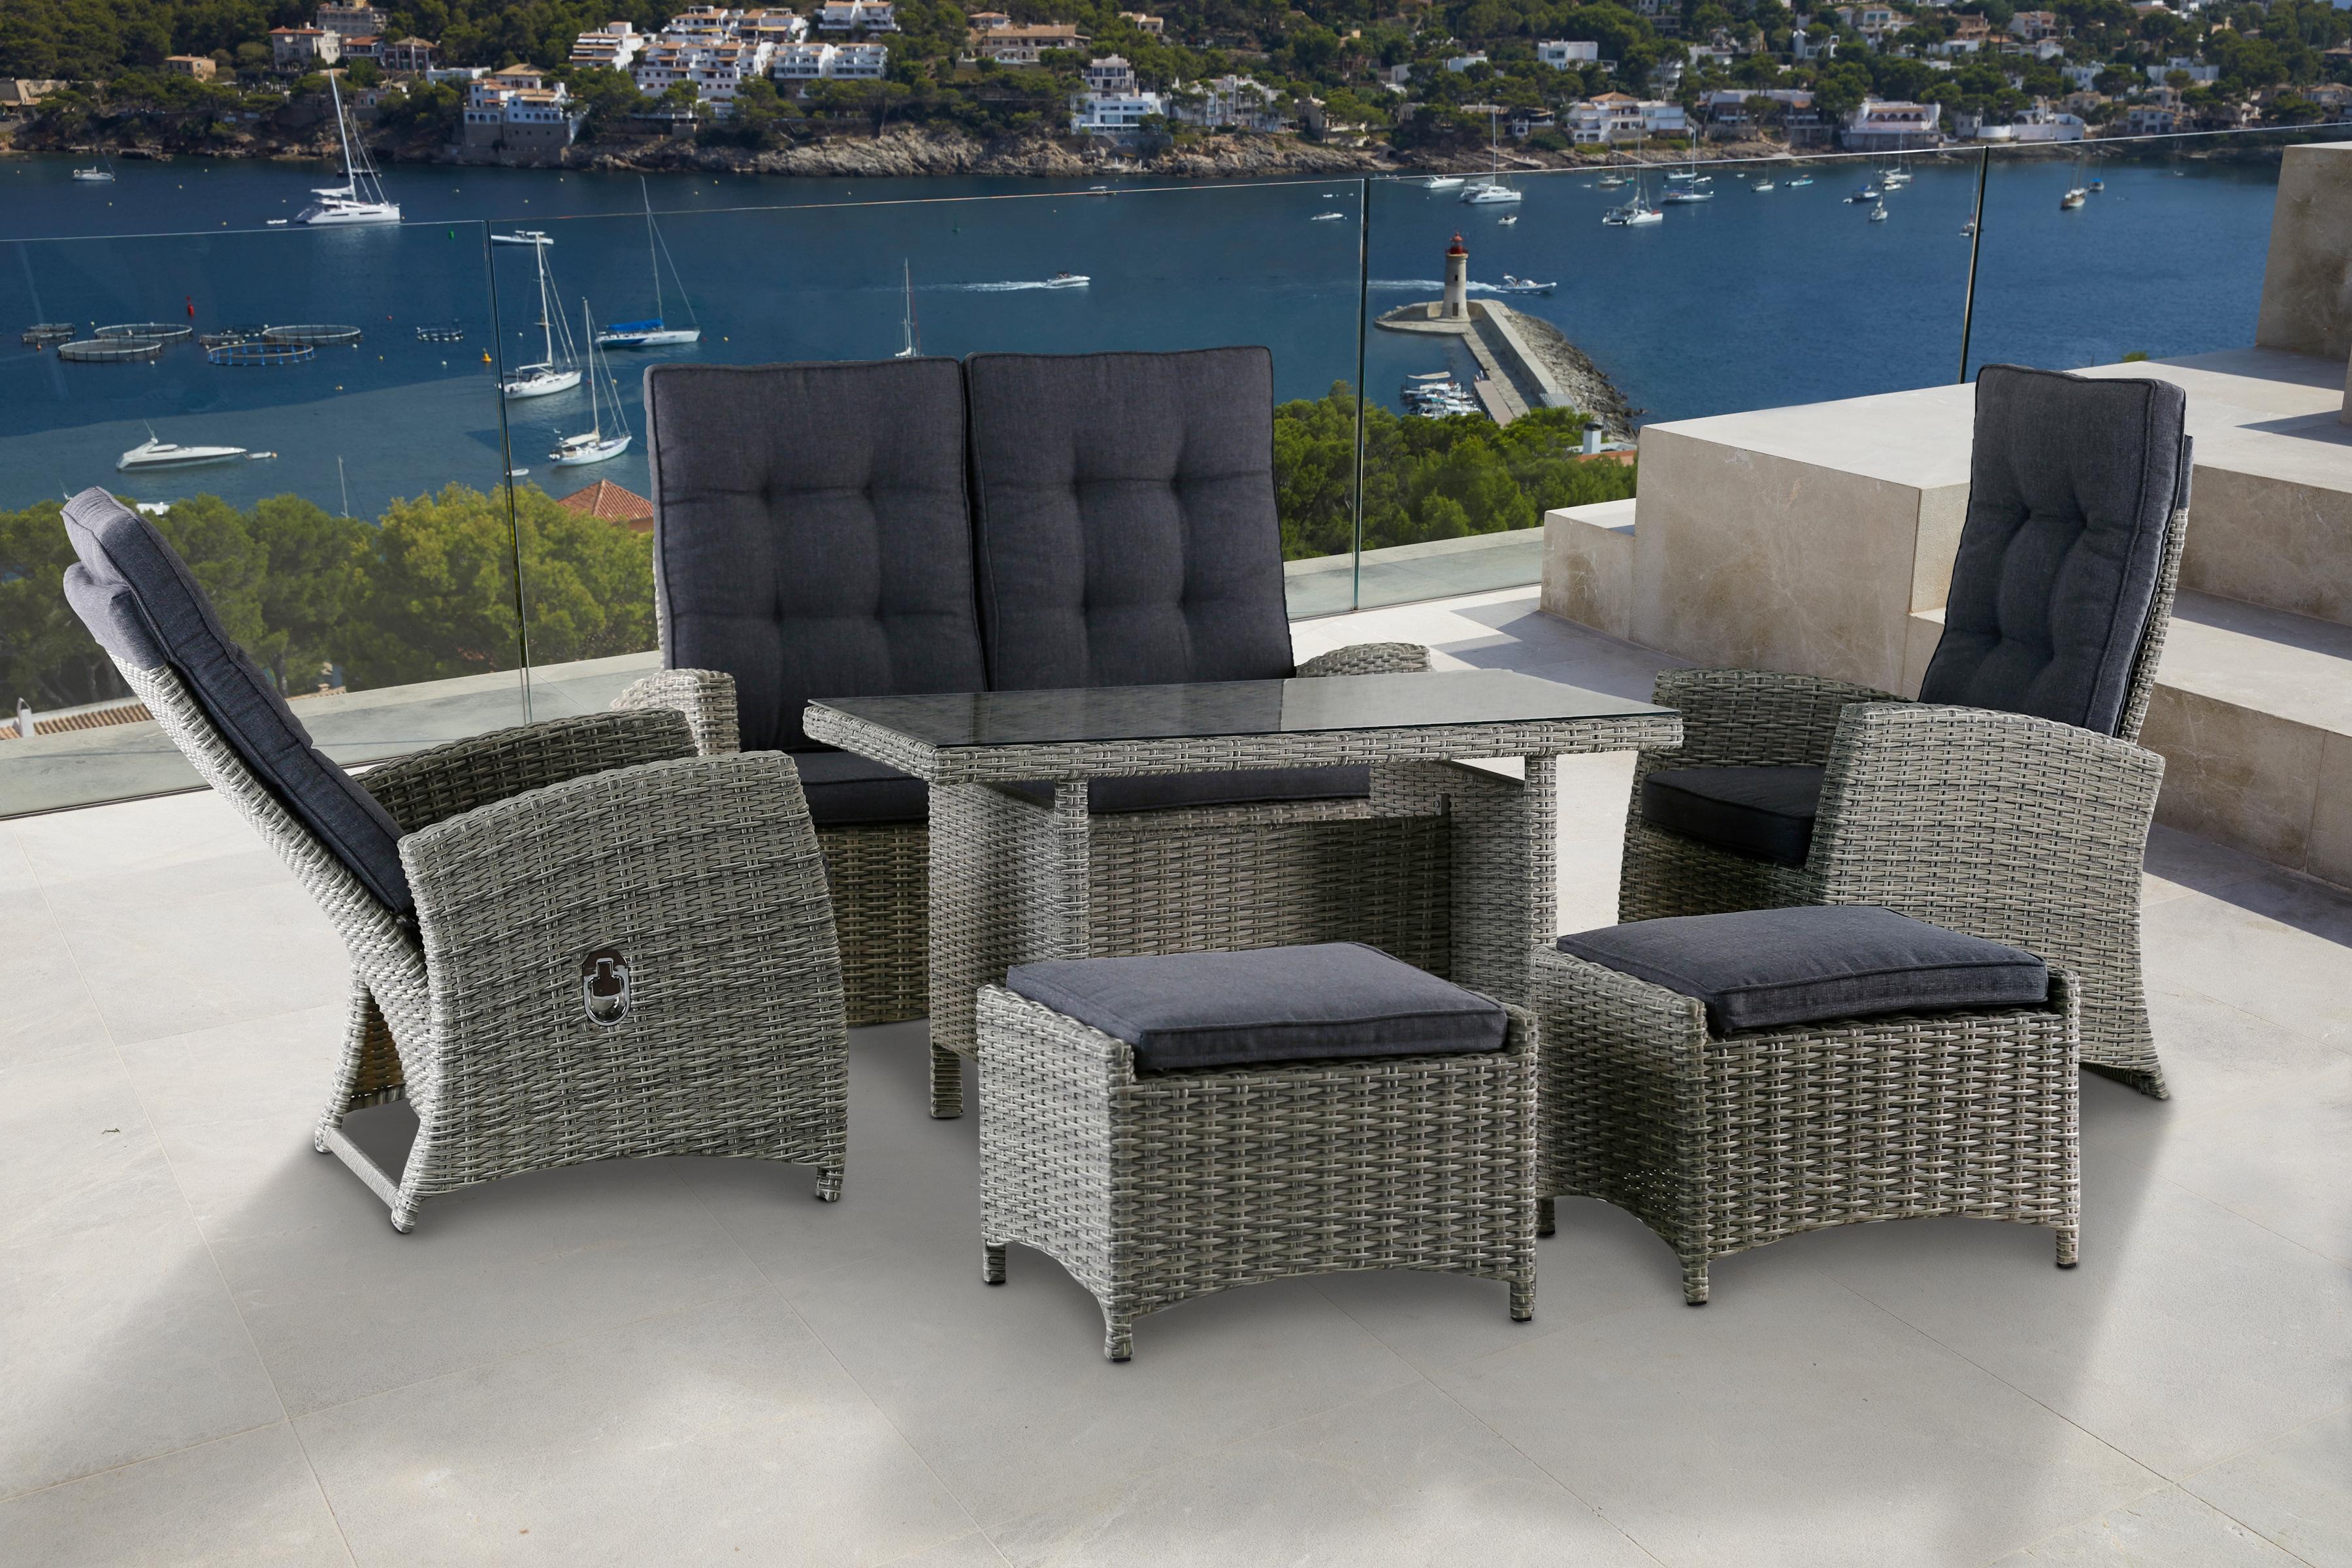 KONIFERA Gartenmöbelset Monaco 12-tlg 2er Sofa 2 Sessel 2 Hocker Tisch Polyrattan